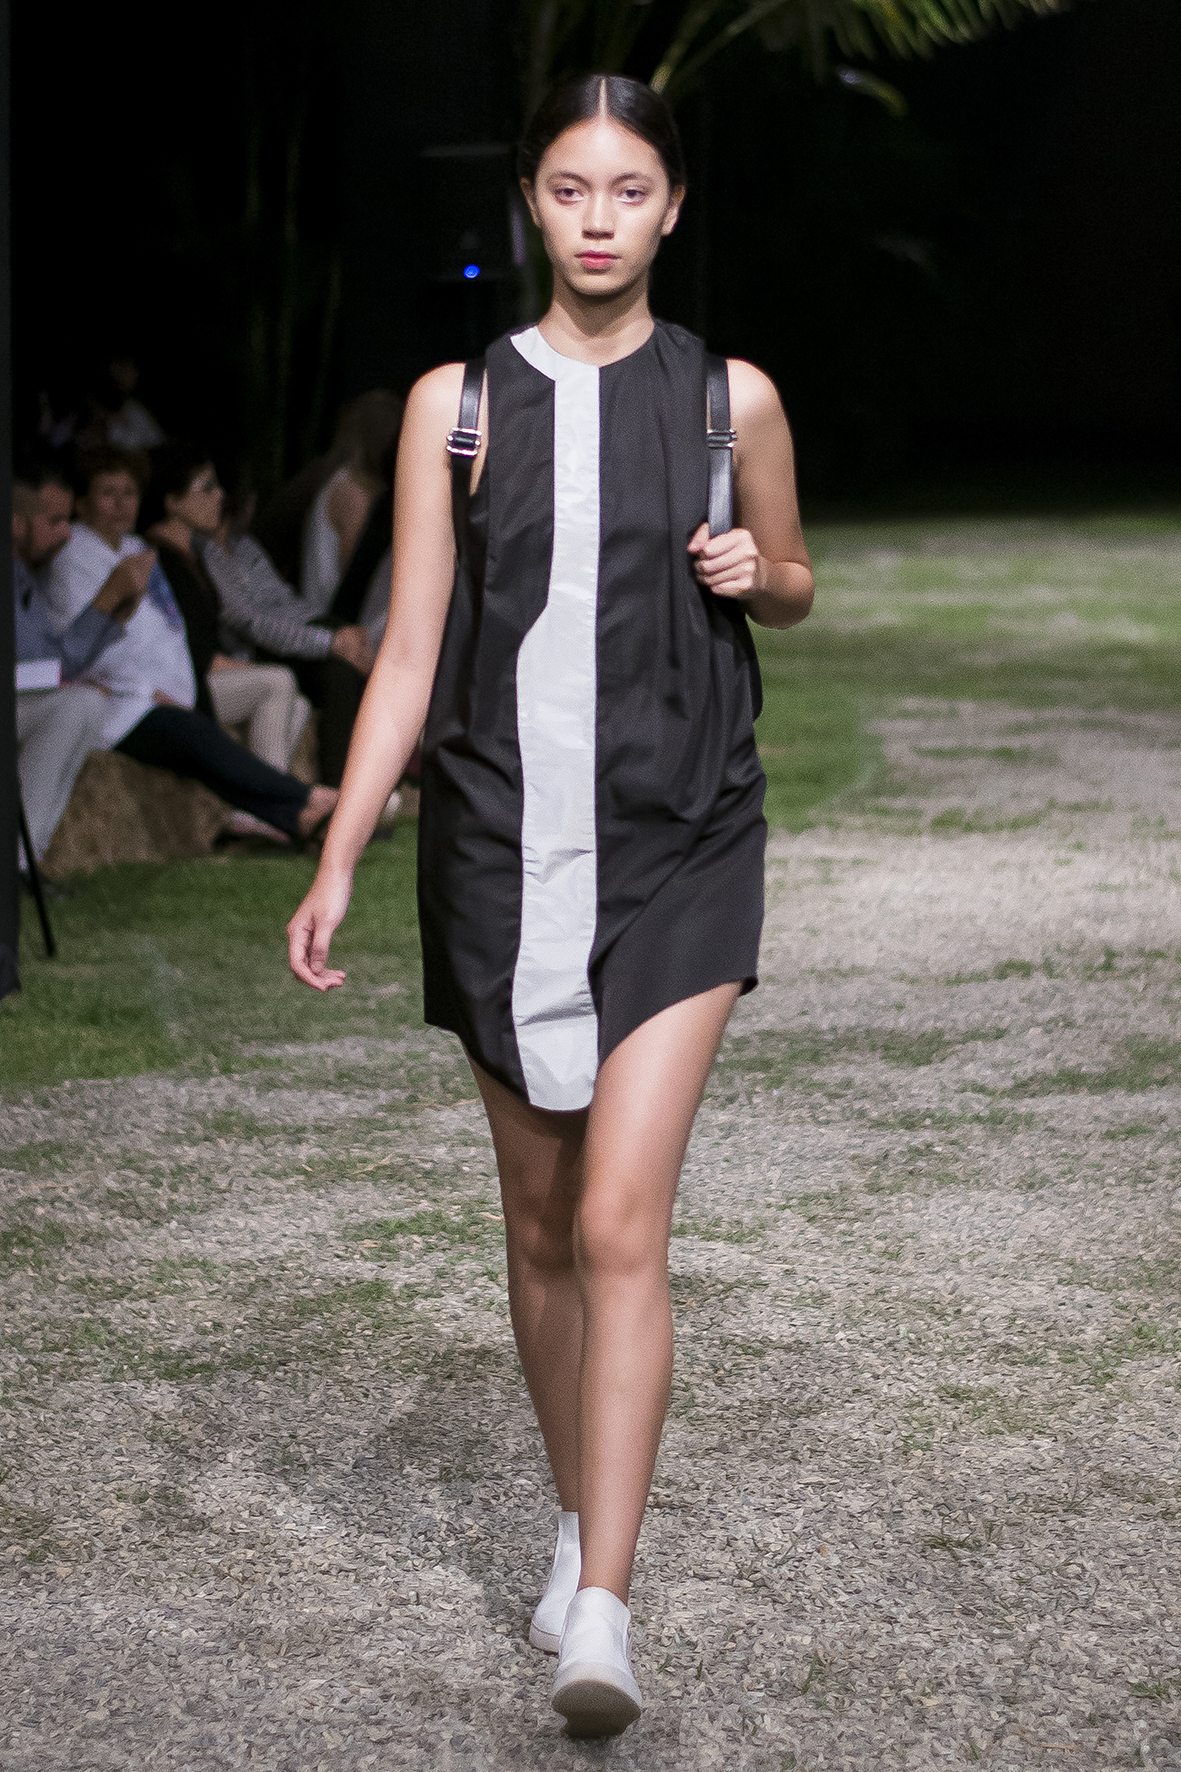 It Project evolet den tavara ceam enrique canales delrieu carolina tola eriko peru fashion moda peruana -  17.JPG